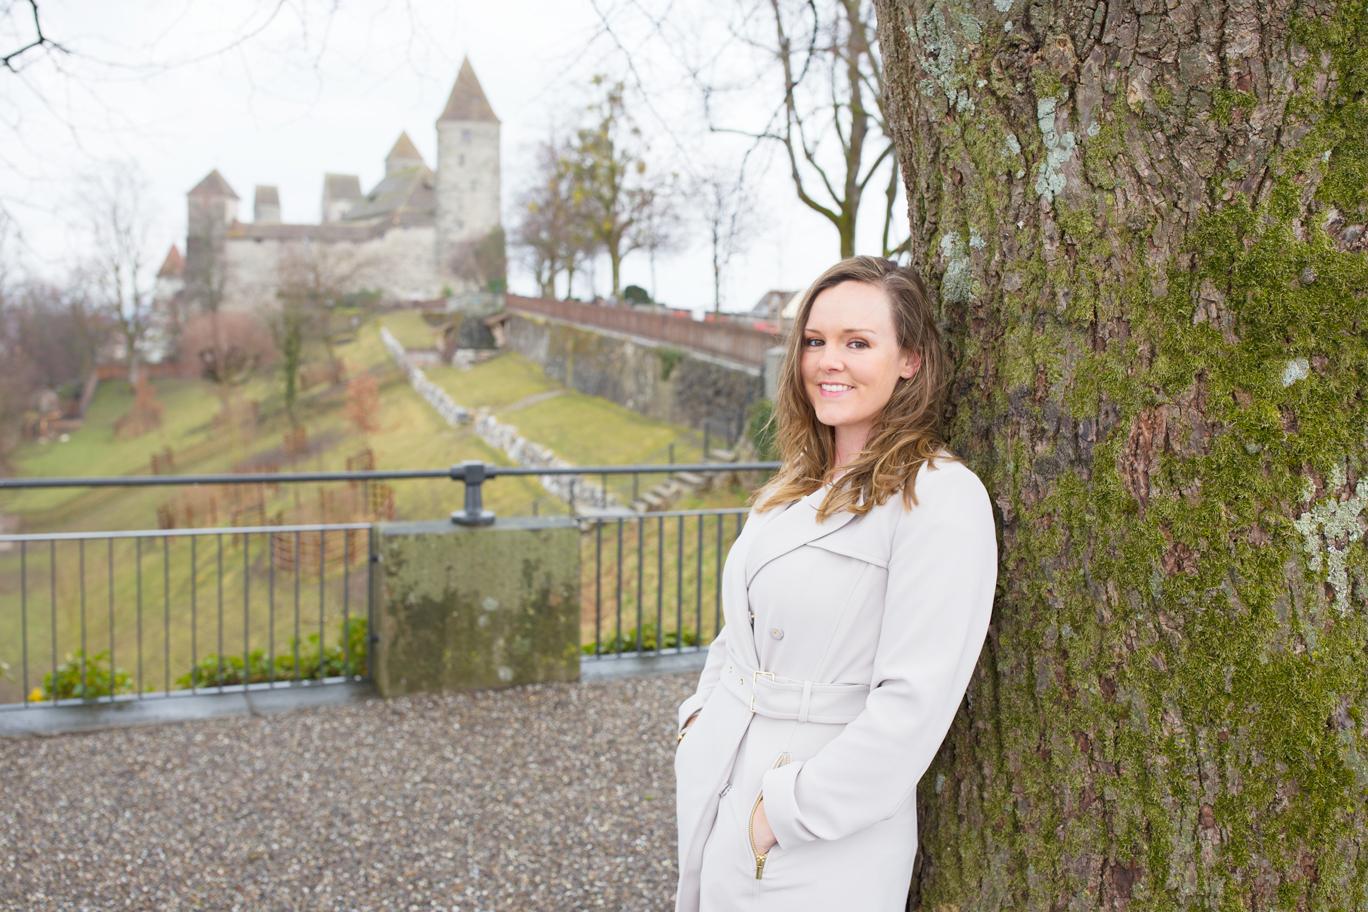 Christy Blum at Rapperswil Castle, St. Gallen, Switzerland — Something Swiss